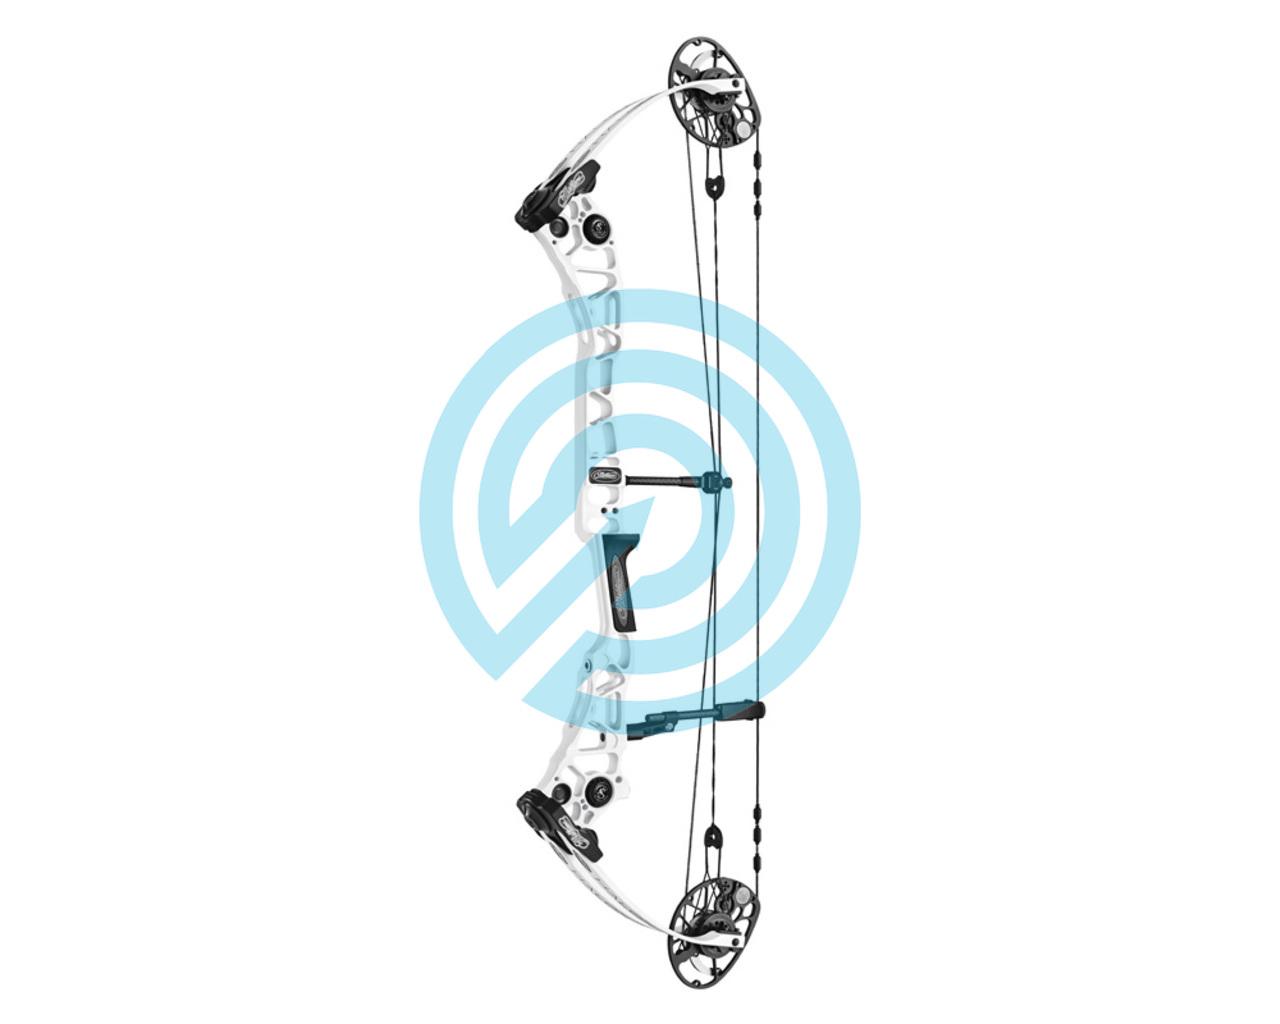 Mathews Compound Bow Halon X Comp   112877-1000   JVD Archery